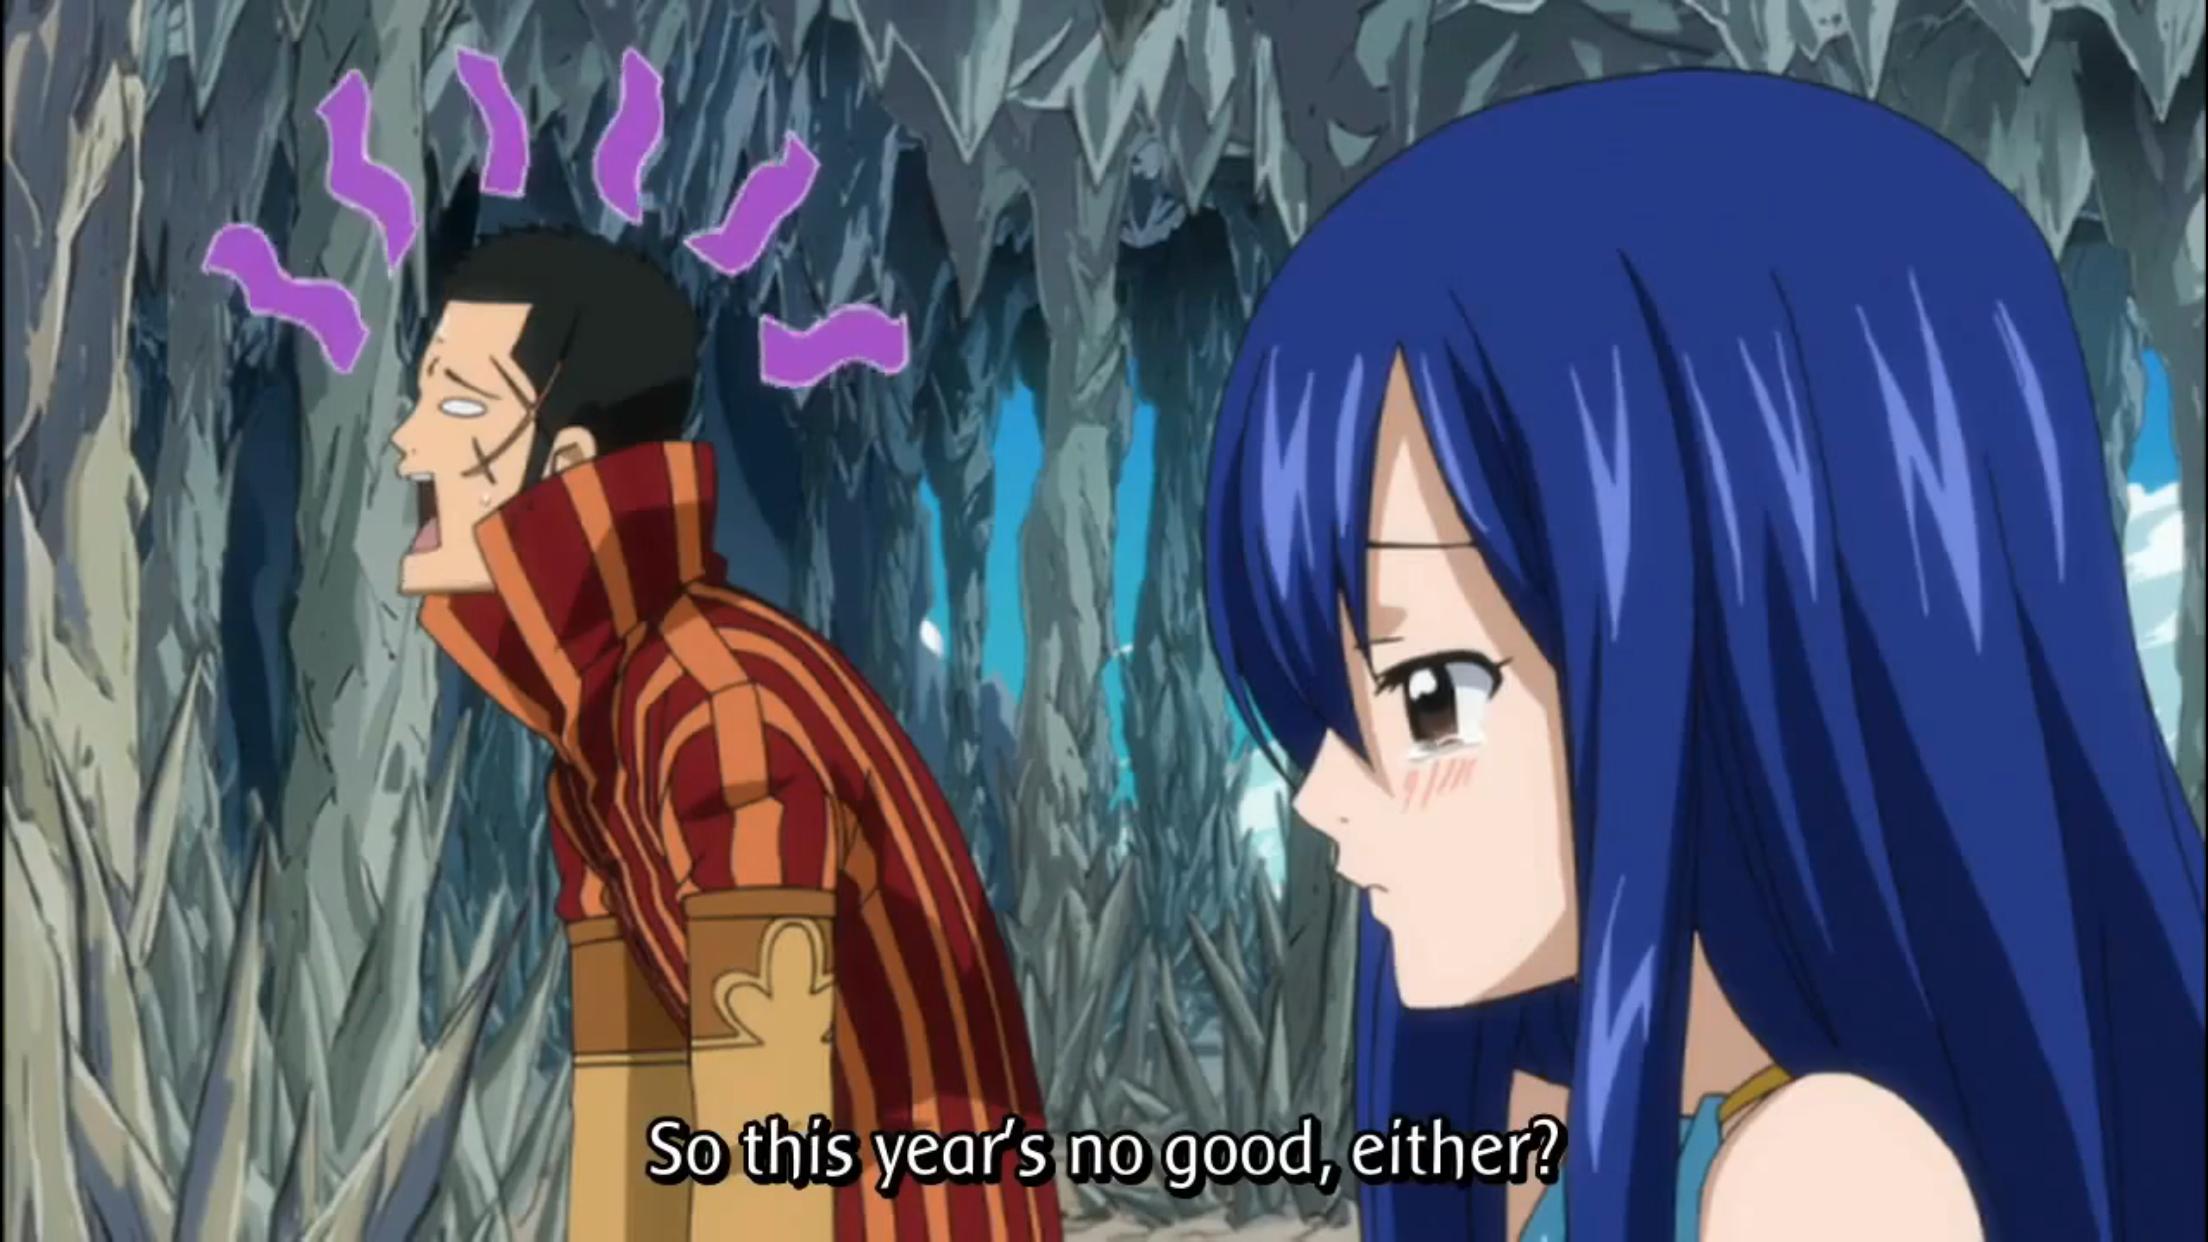 Fairy Tail Episode 100 Fairy tail episodes, Anime, The